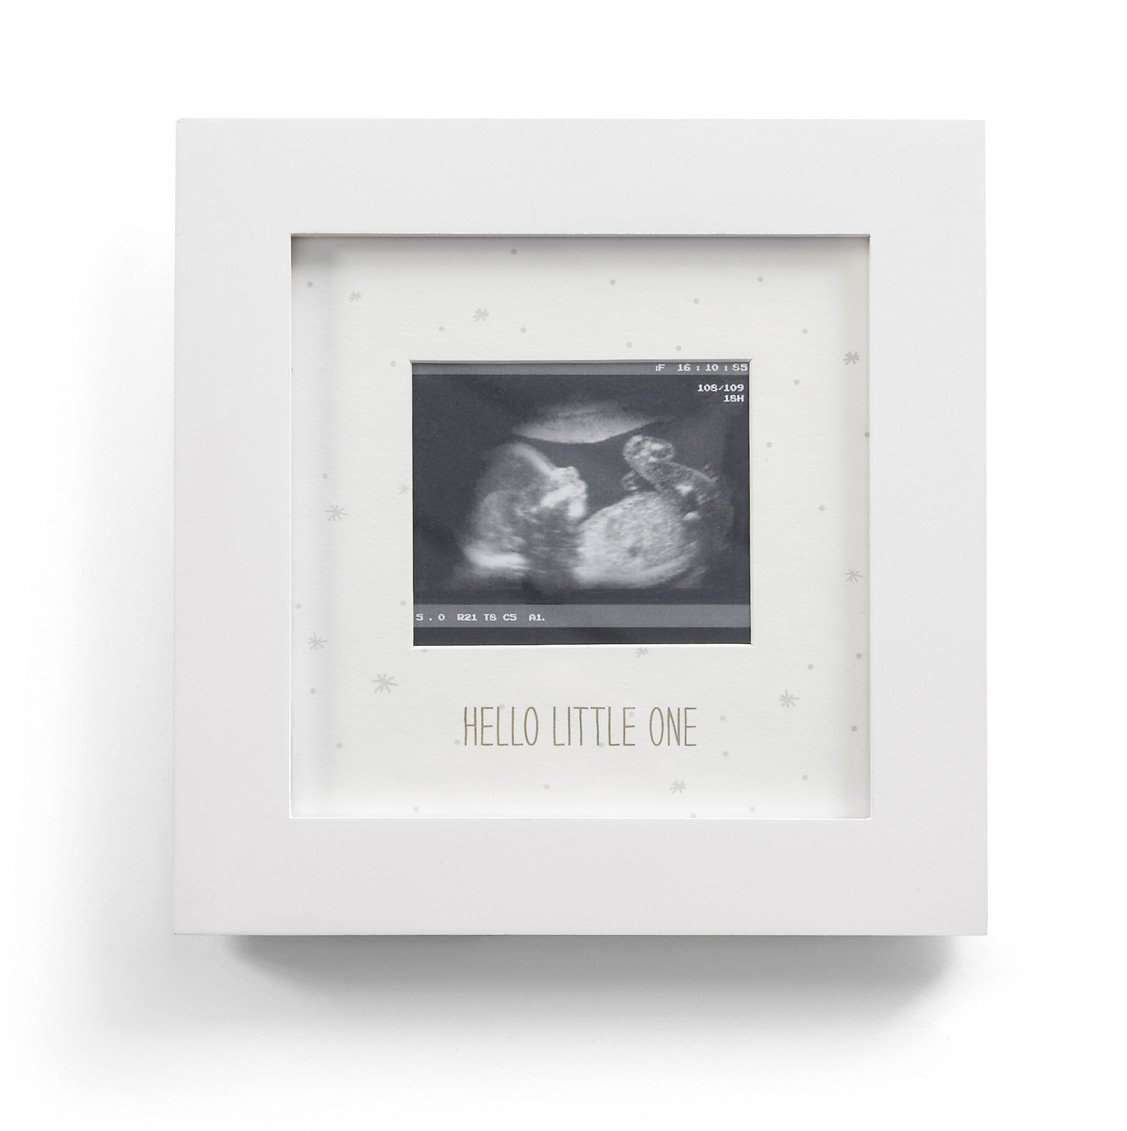 Mamas & Papas 491135007 Bilderrahmen für Ultraschallbild, englische Beschriftung 'Welcome To The World' (Weihnachten) 491135006